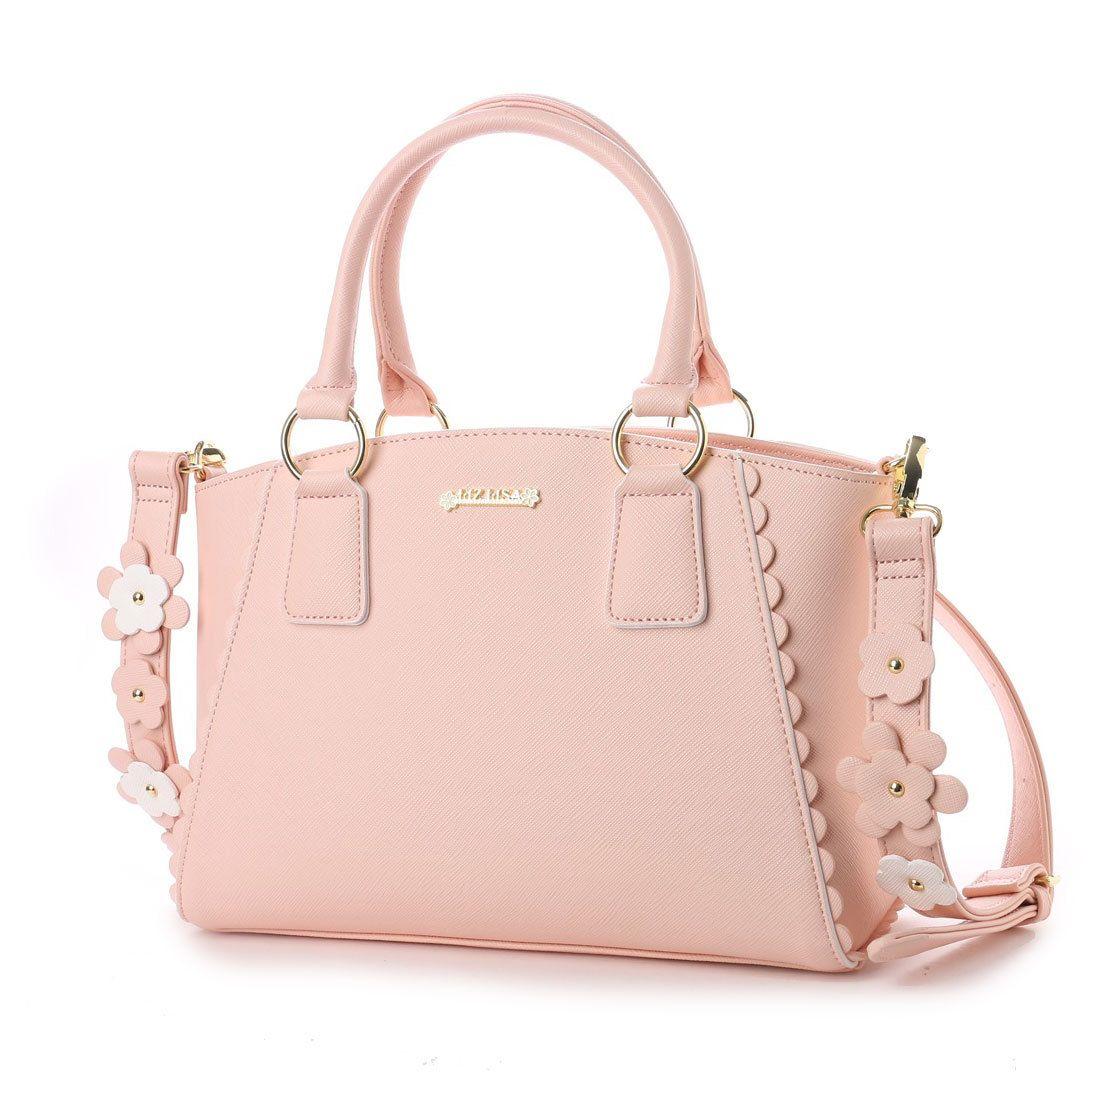 5d28d8c95a23 リズリサ LIZ LISA パスティー 花モチーフ使いショルダーストラップ付2WAYバッグ (ピンク)